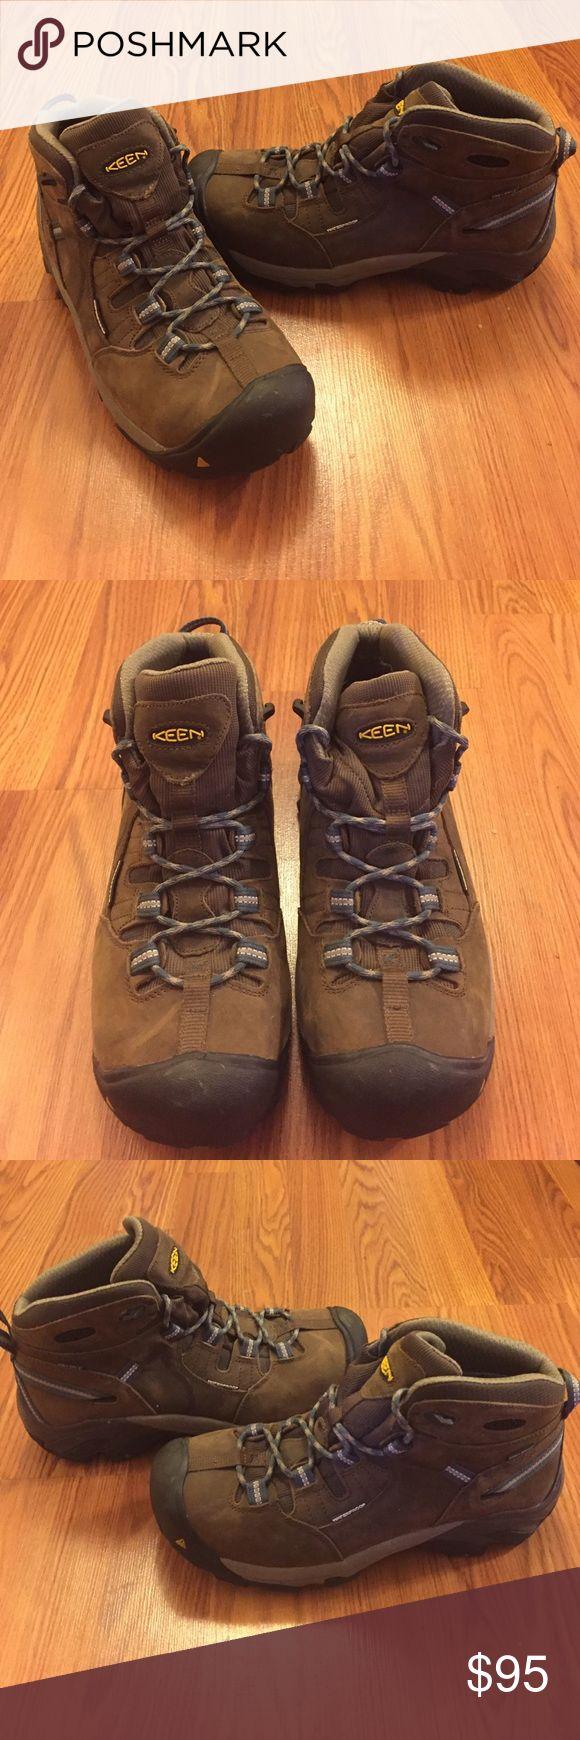 25 best ideas about best steel toe boots on